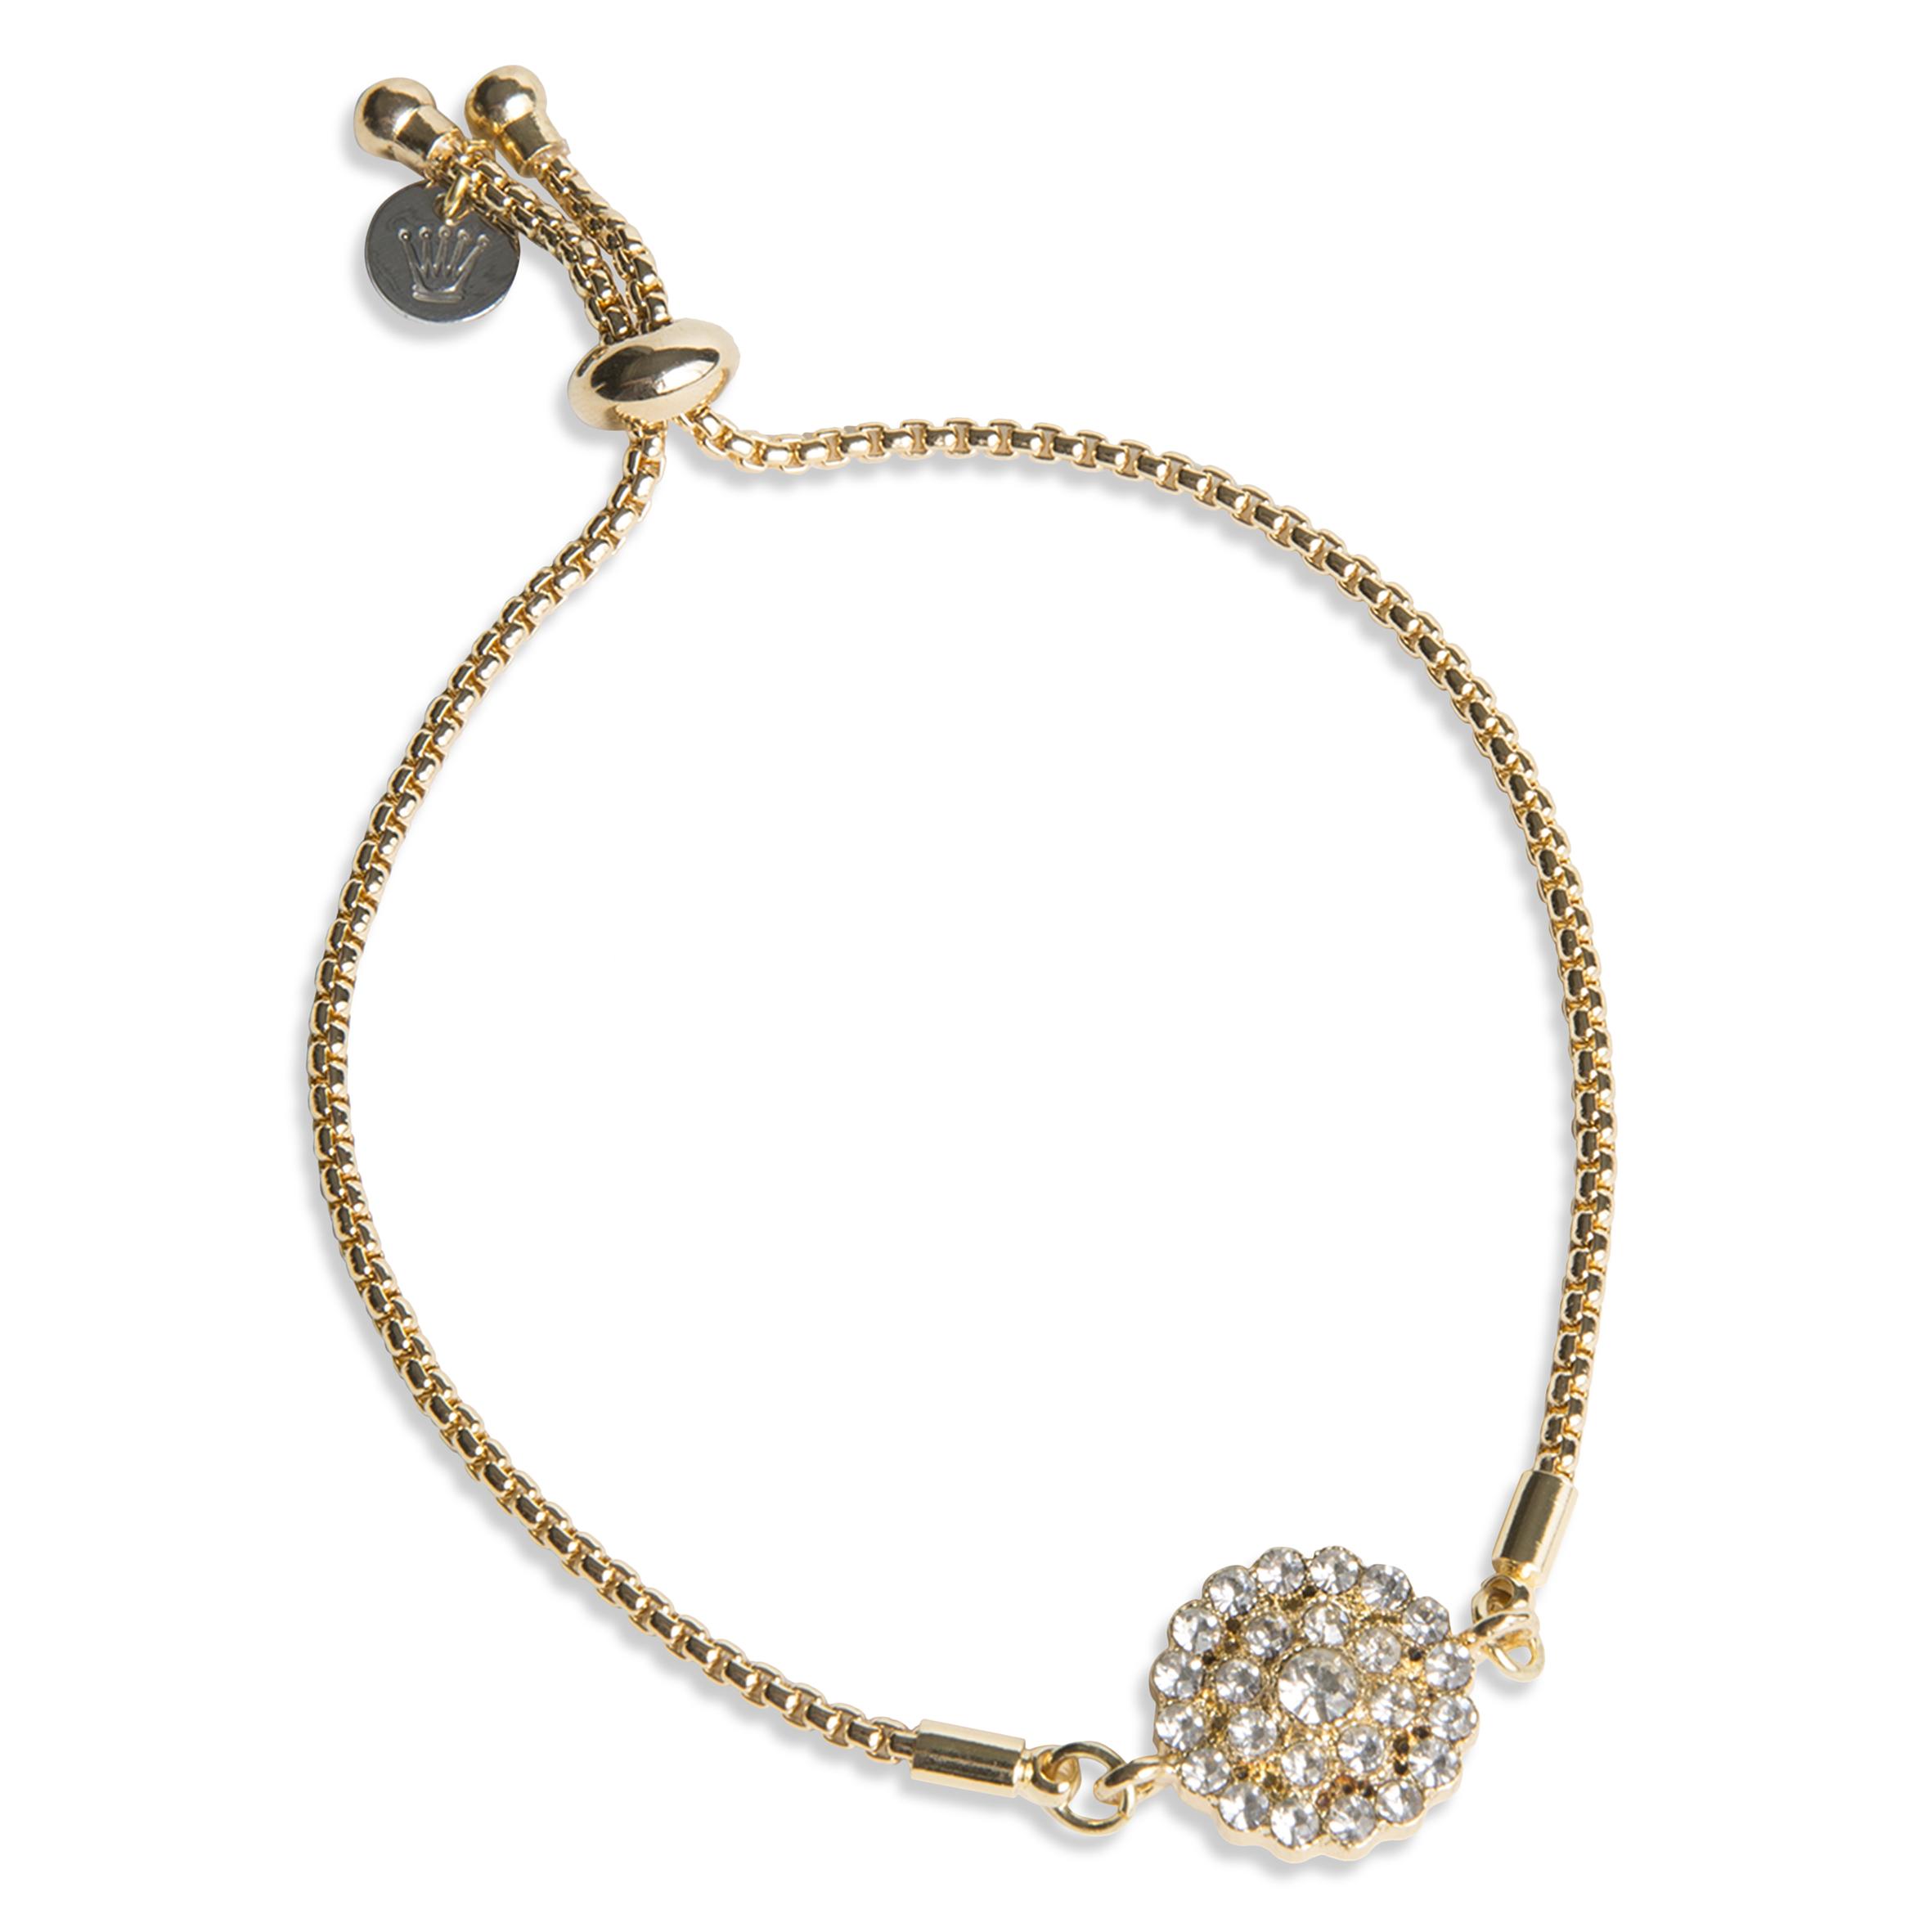 Damsmycke pfg Stockholm Pearls for Girls-Amie Bracelet 94914-07